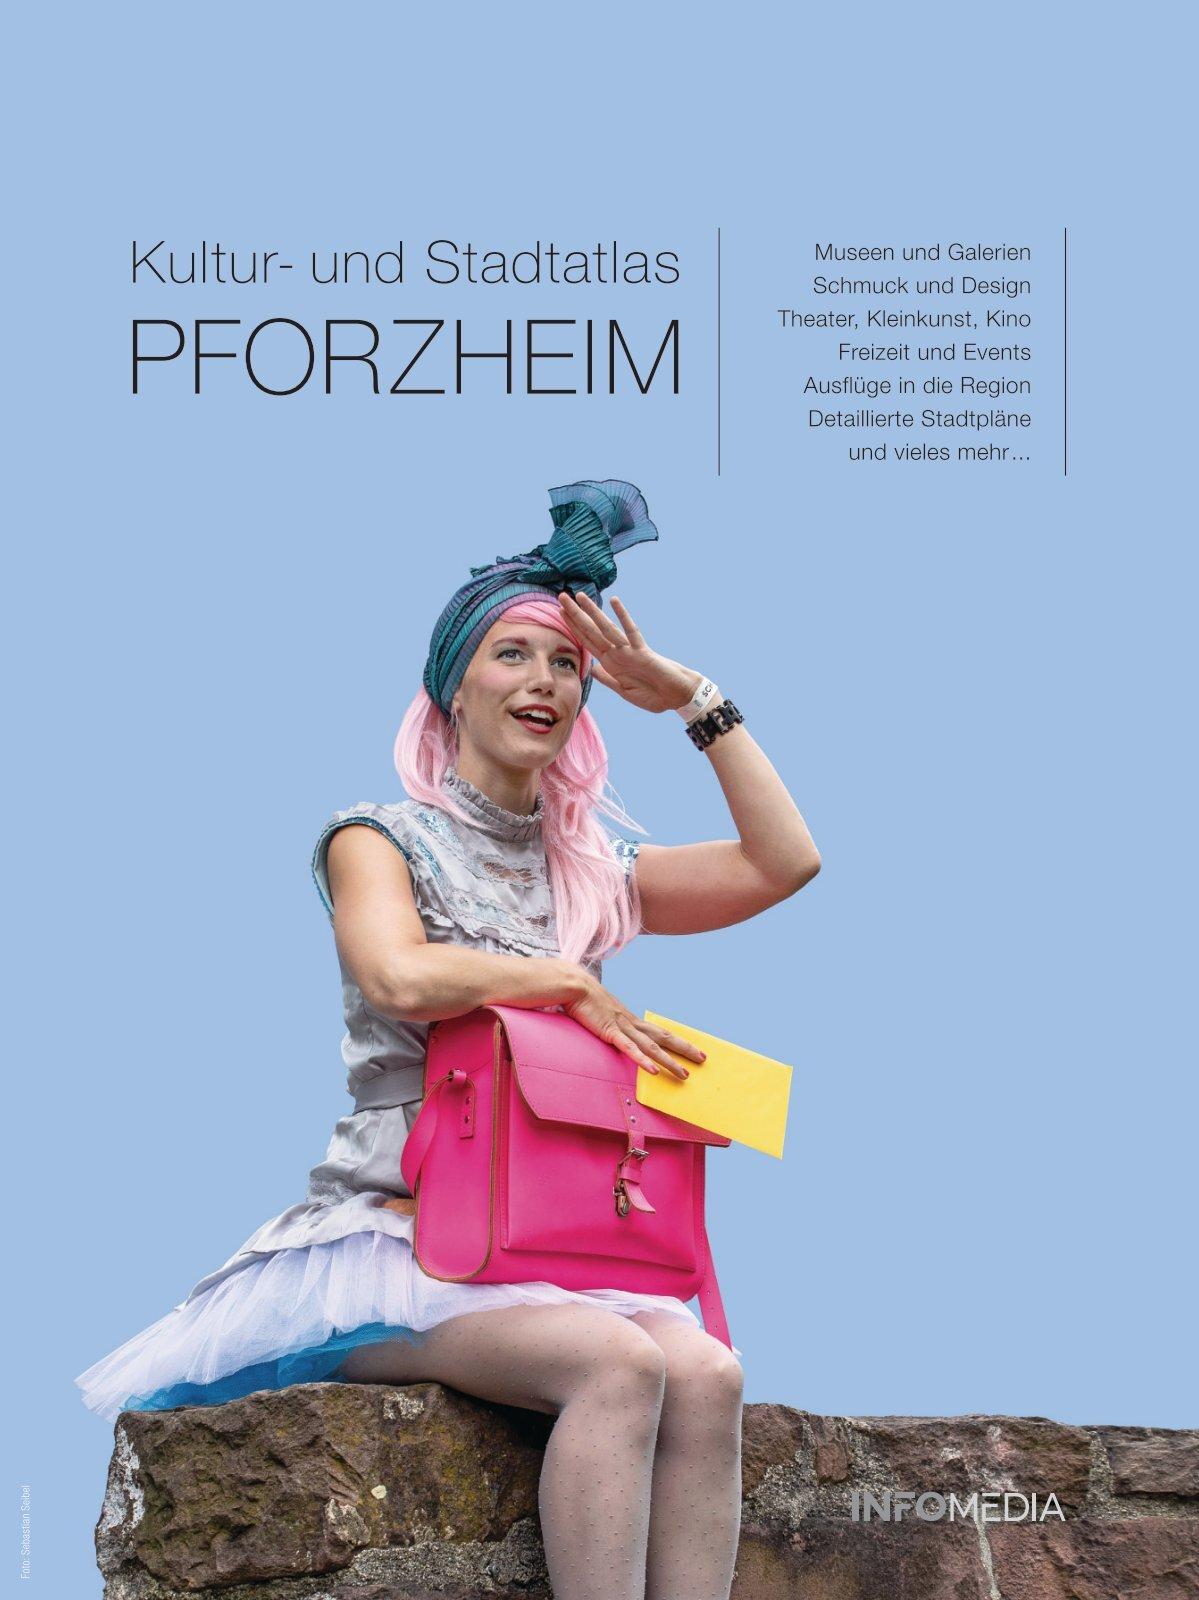 Kultur- und Stadtatlas 2021-22